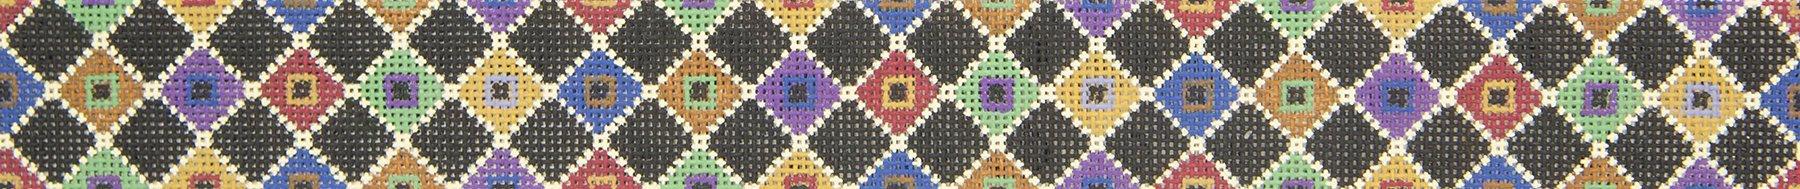 SR3502 Belt Diamond Patch Susan Roberts Needlepoint